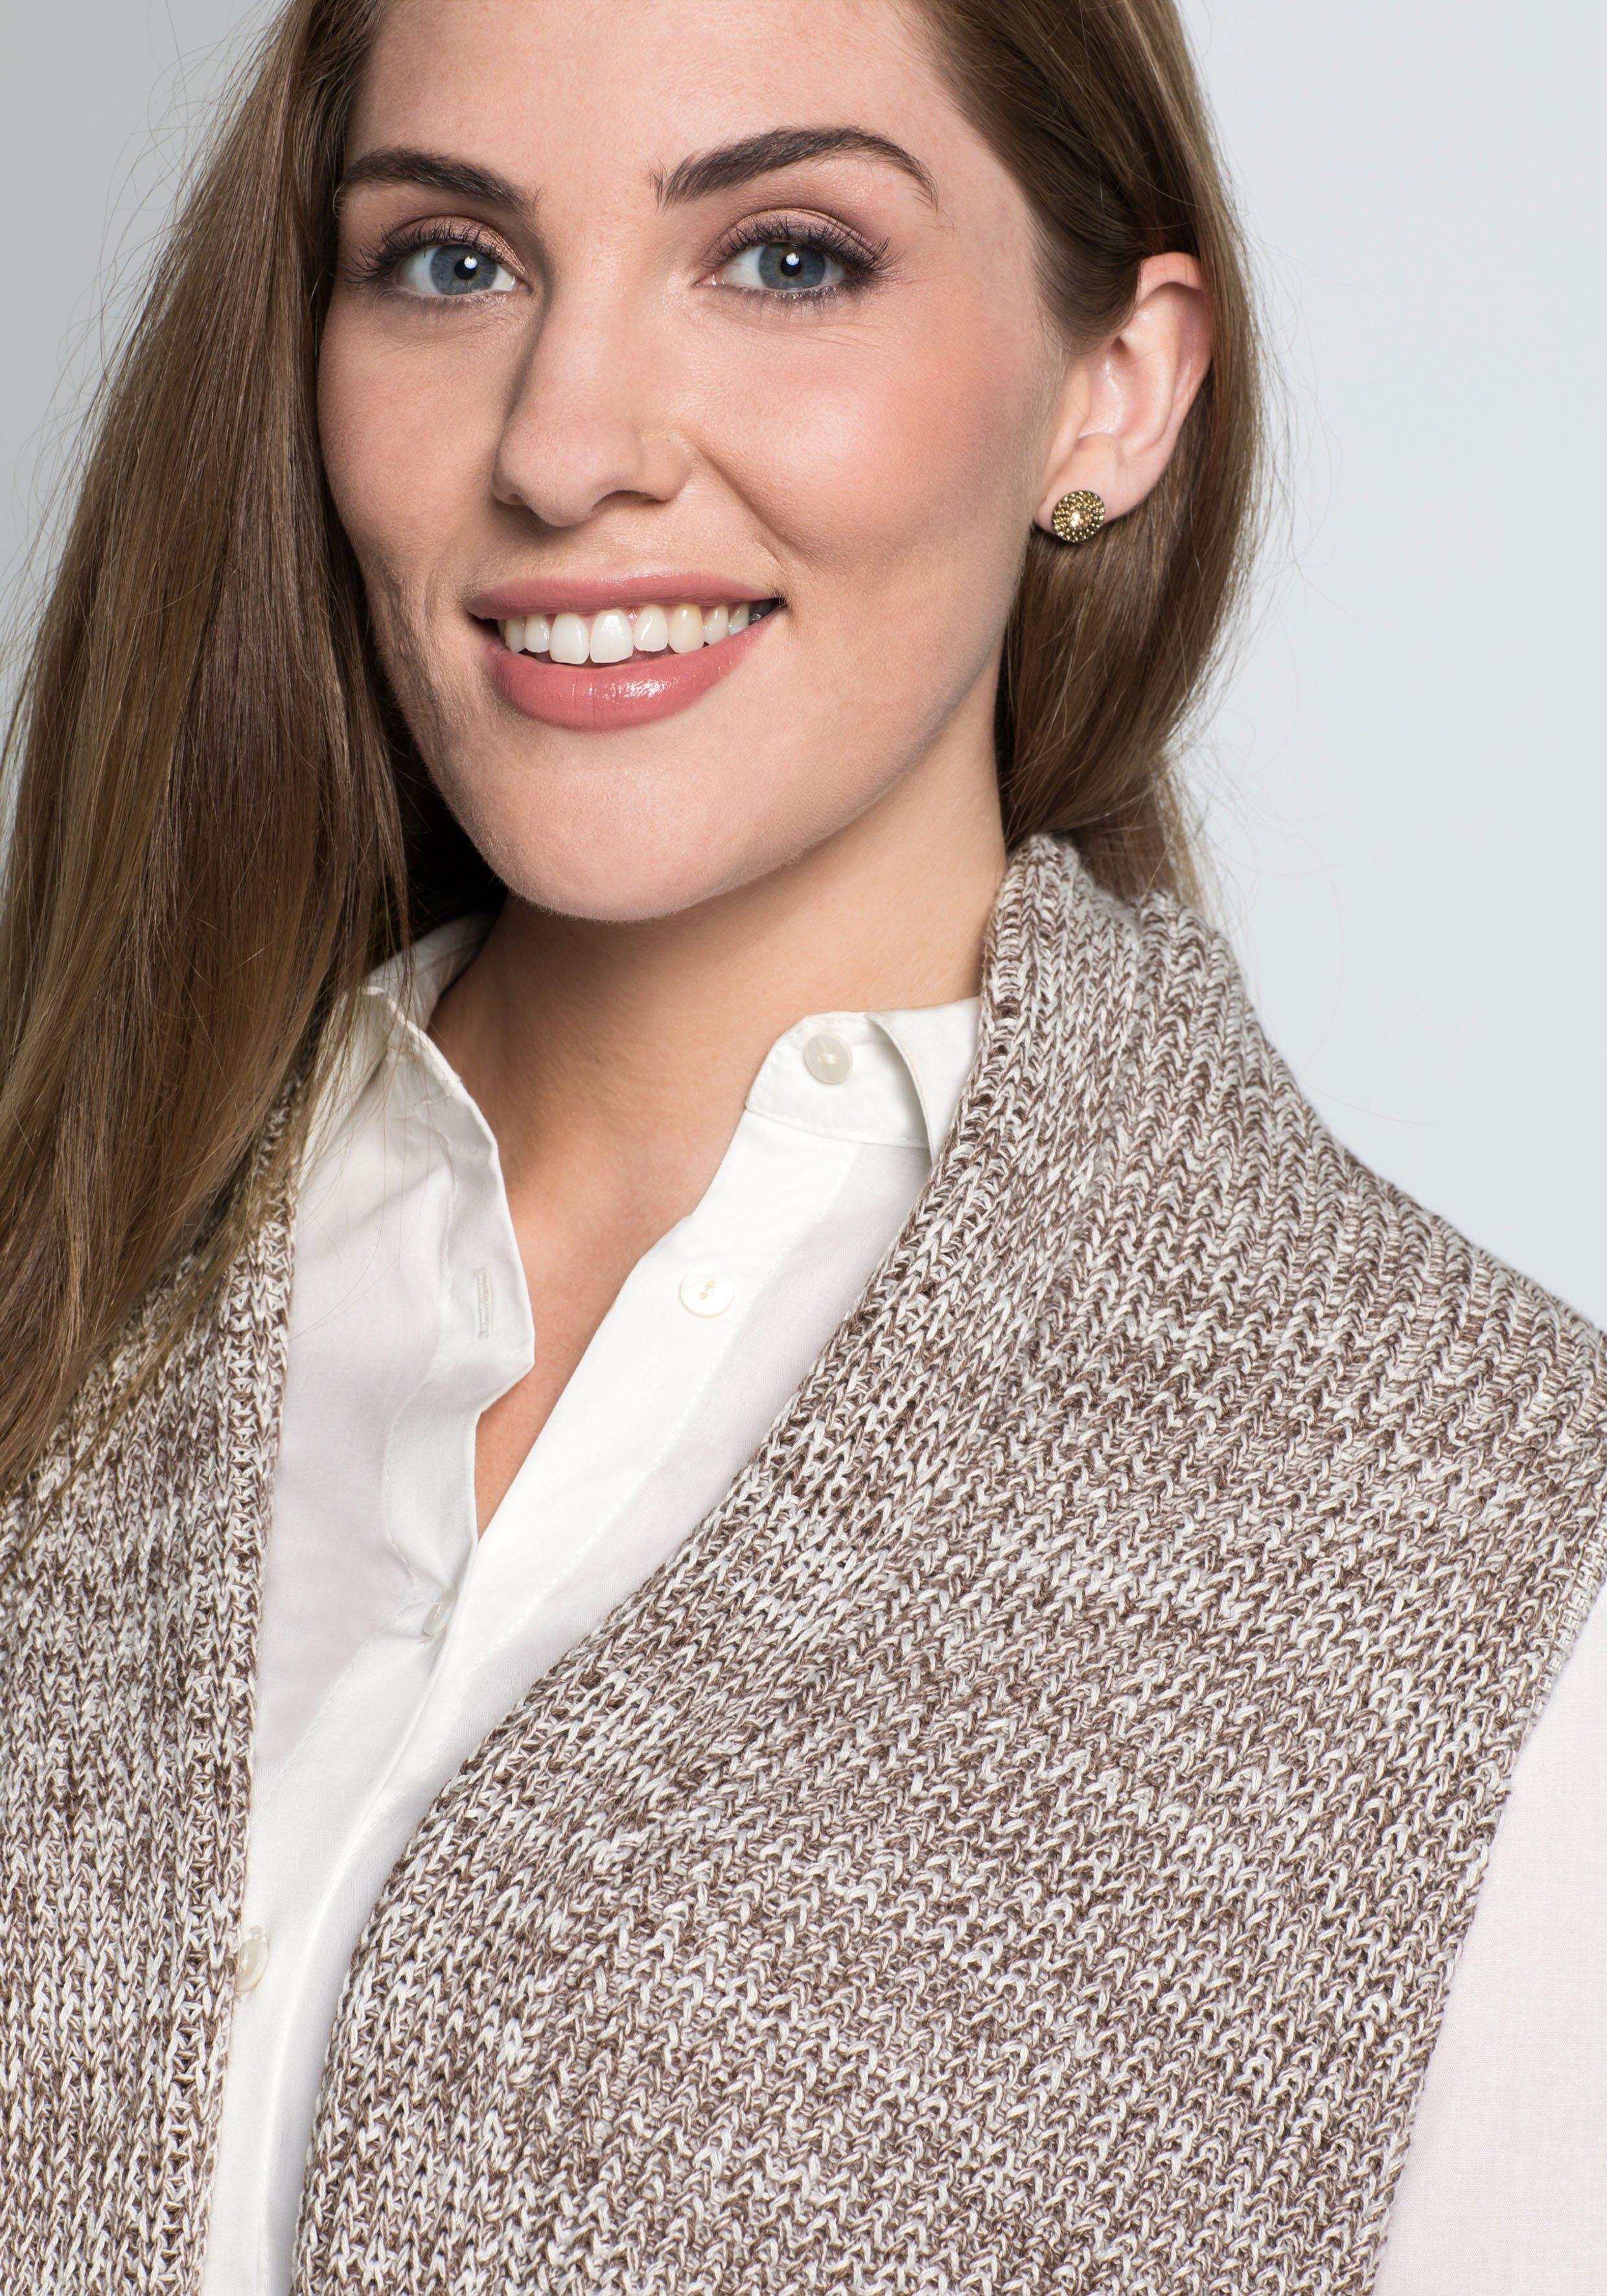 Strickweste Zipfelform Sheego Kaufen In Online vmPNwy0O8n